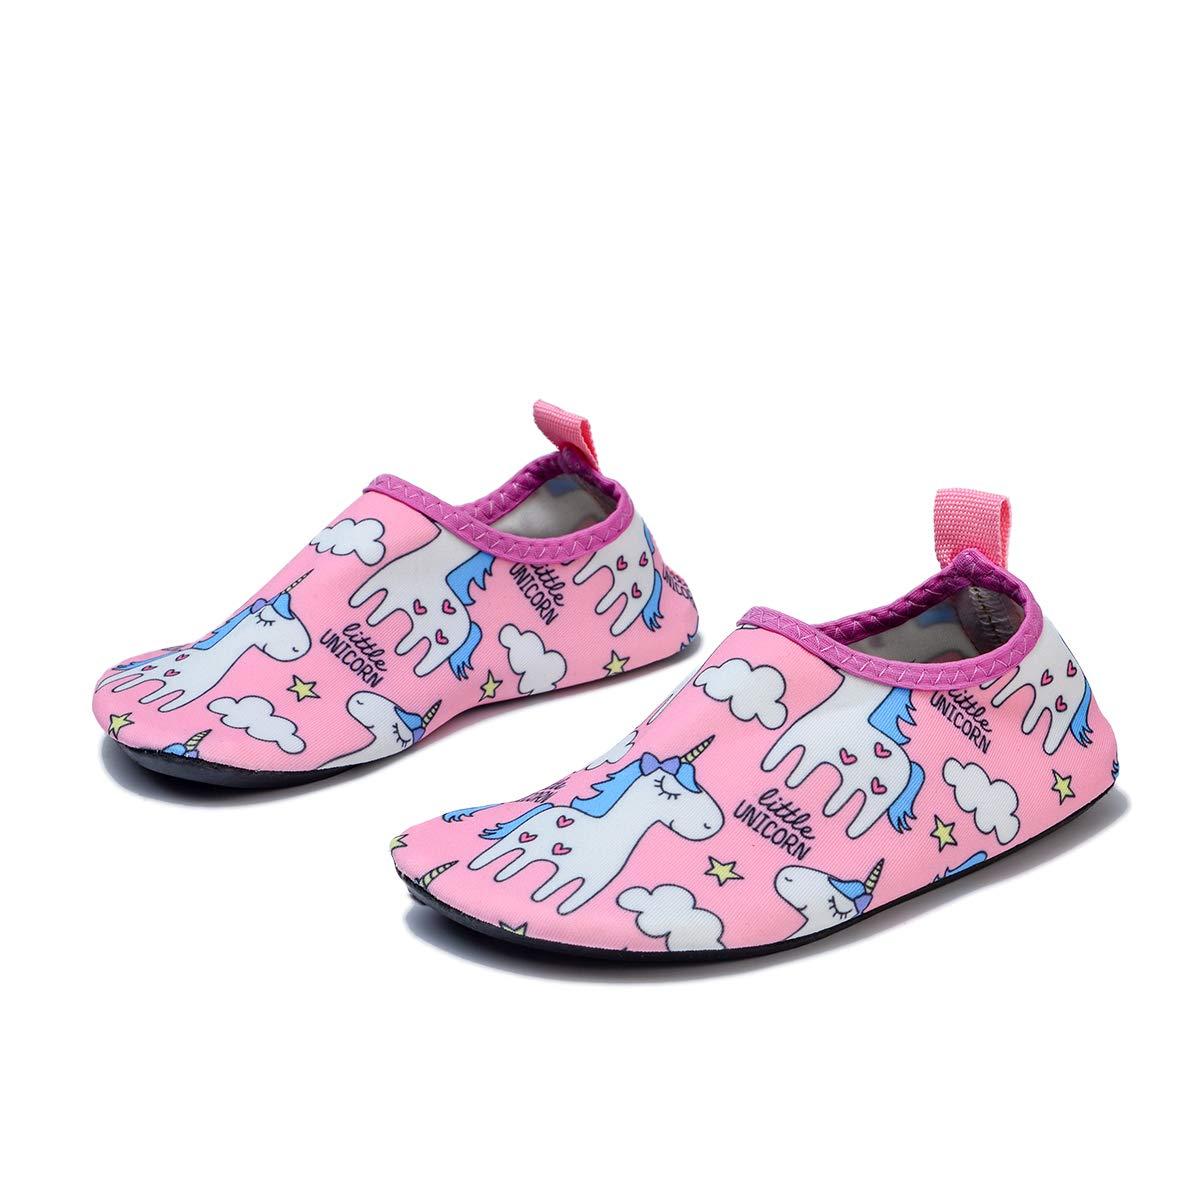 Unicorn Cat Girls Boys Kids Aqua Socks Swim Water Shoes Quick Dry Non-Slip Shoes